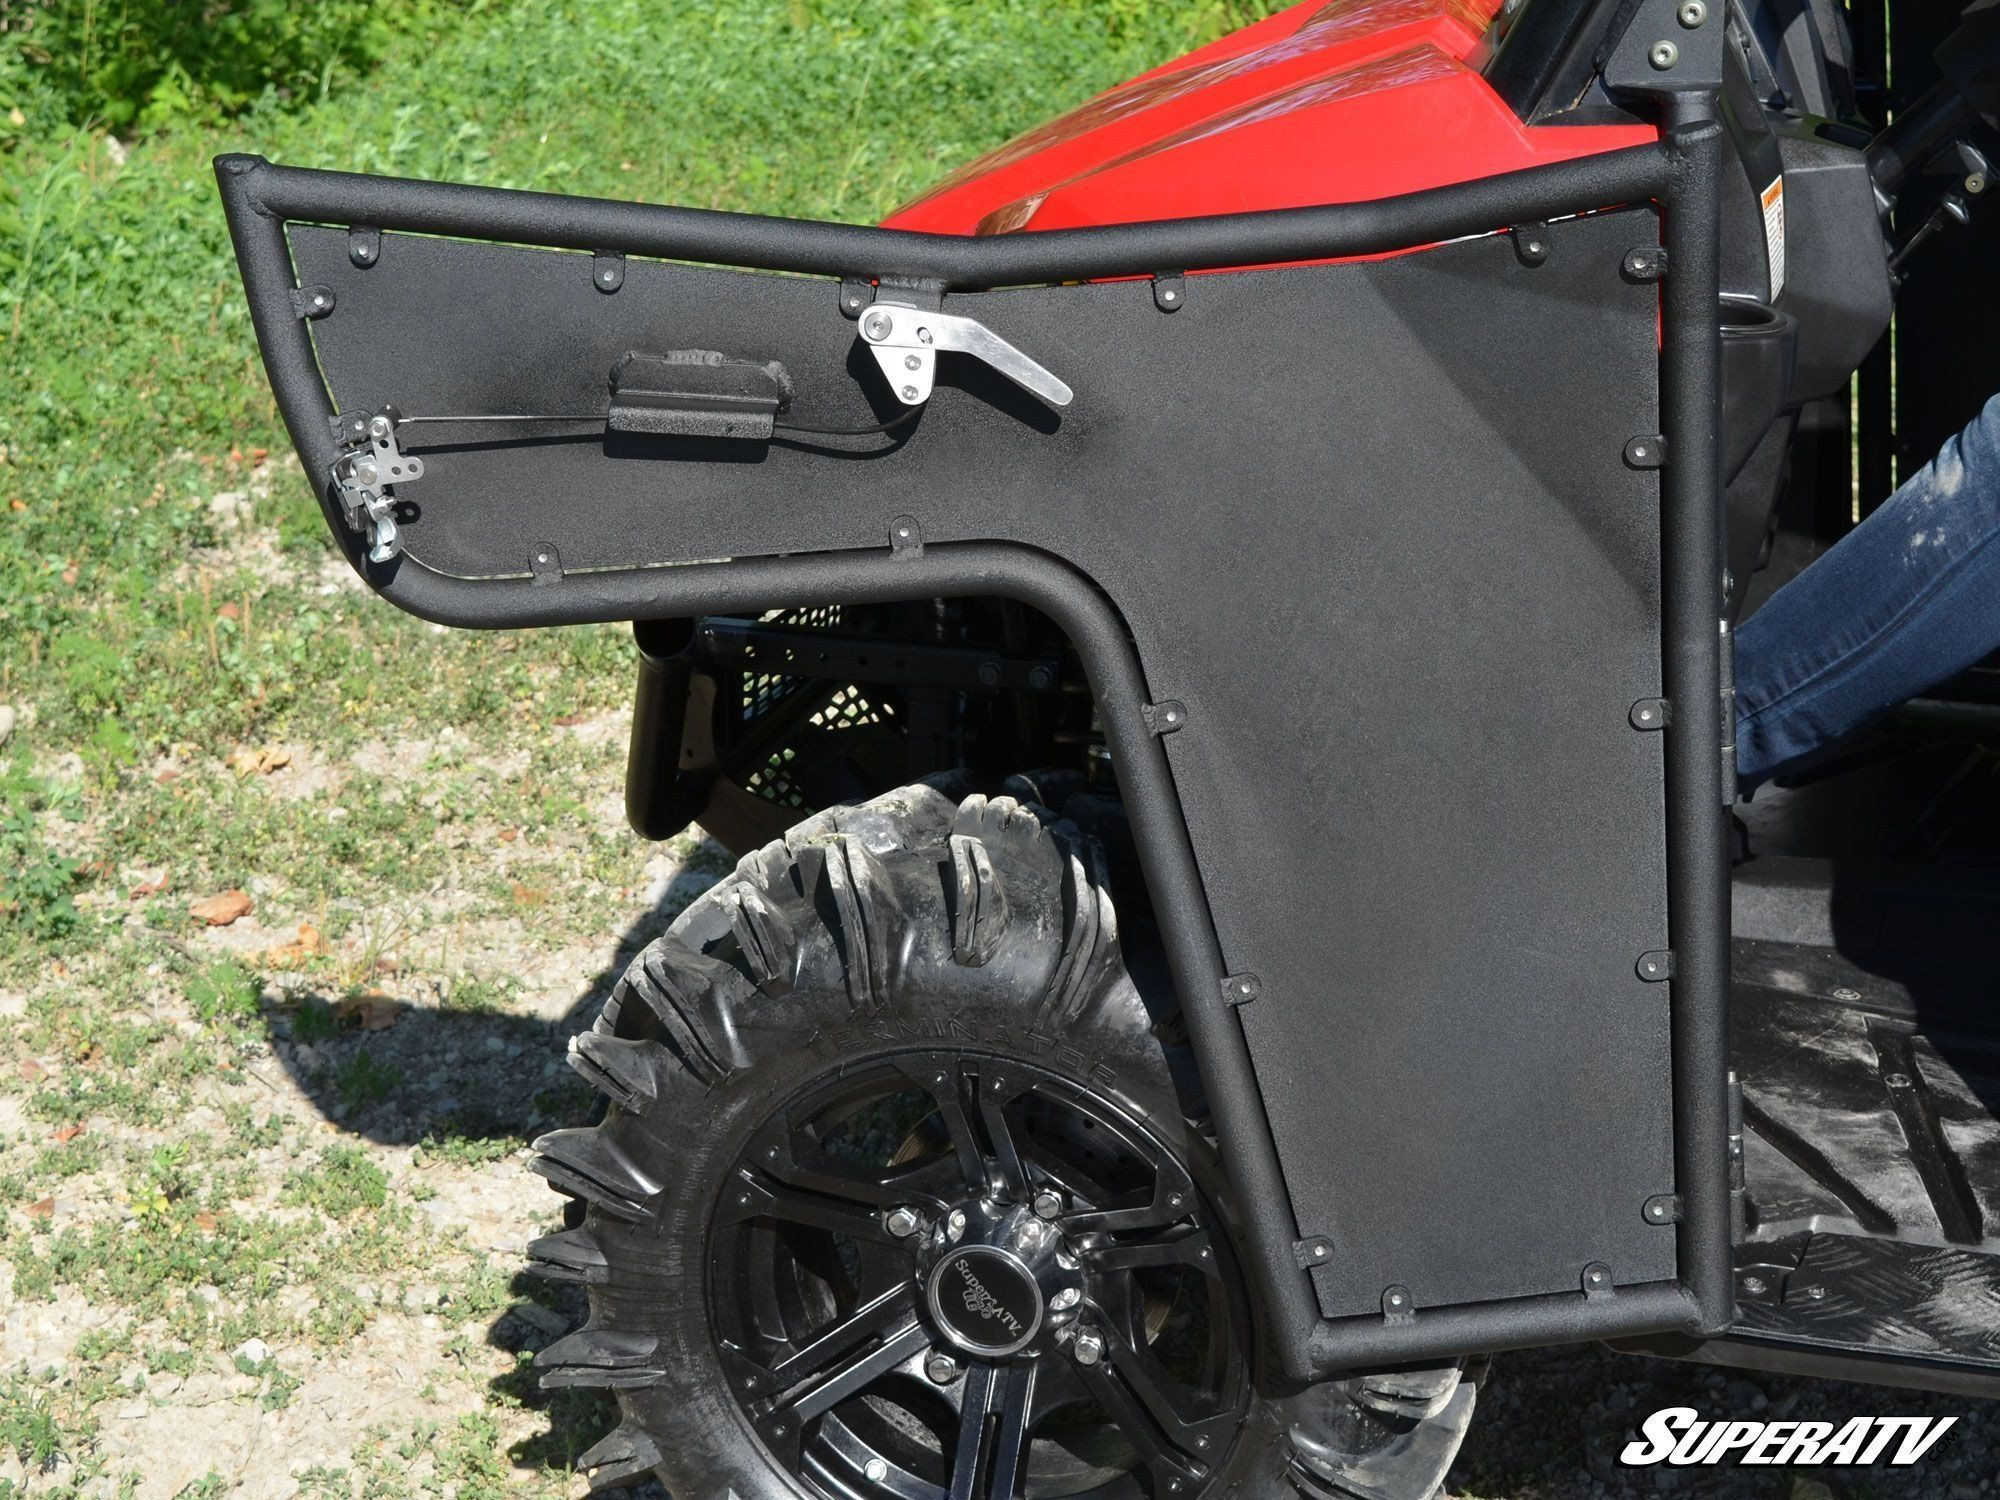 Polaris Ranger Midsize 570 Doors Polaris Ranger Ranger Side By Side Accessories